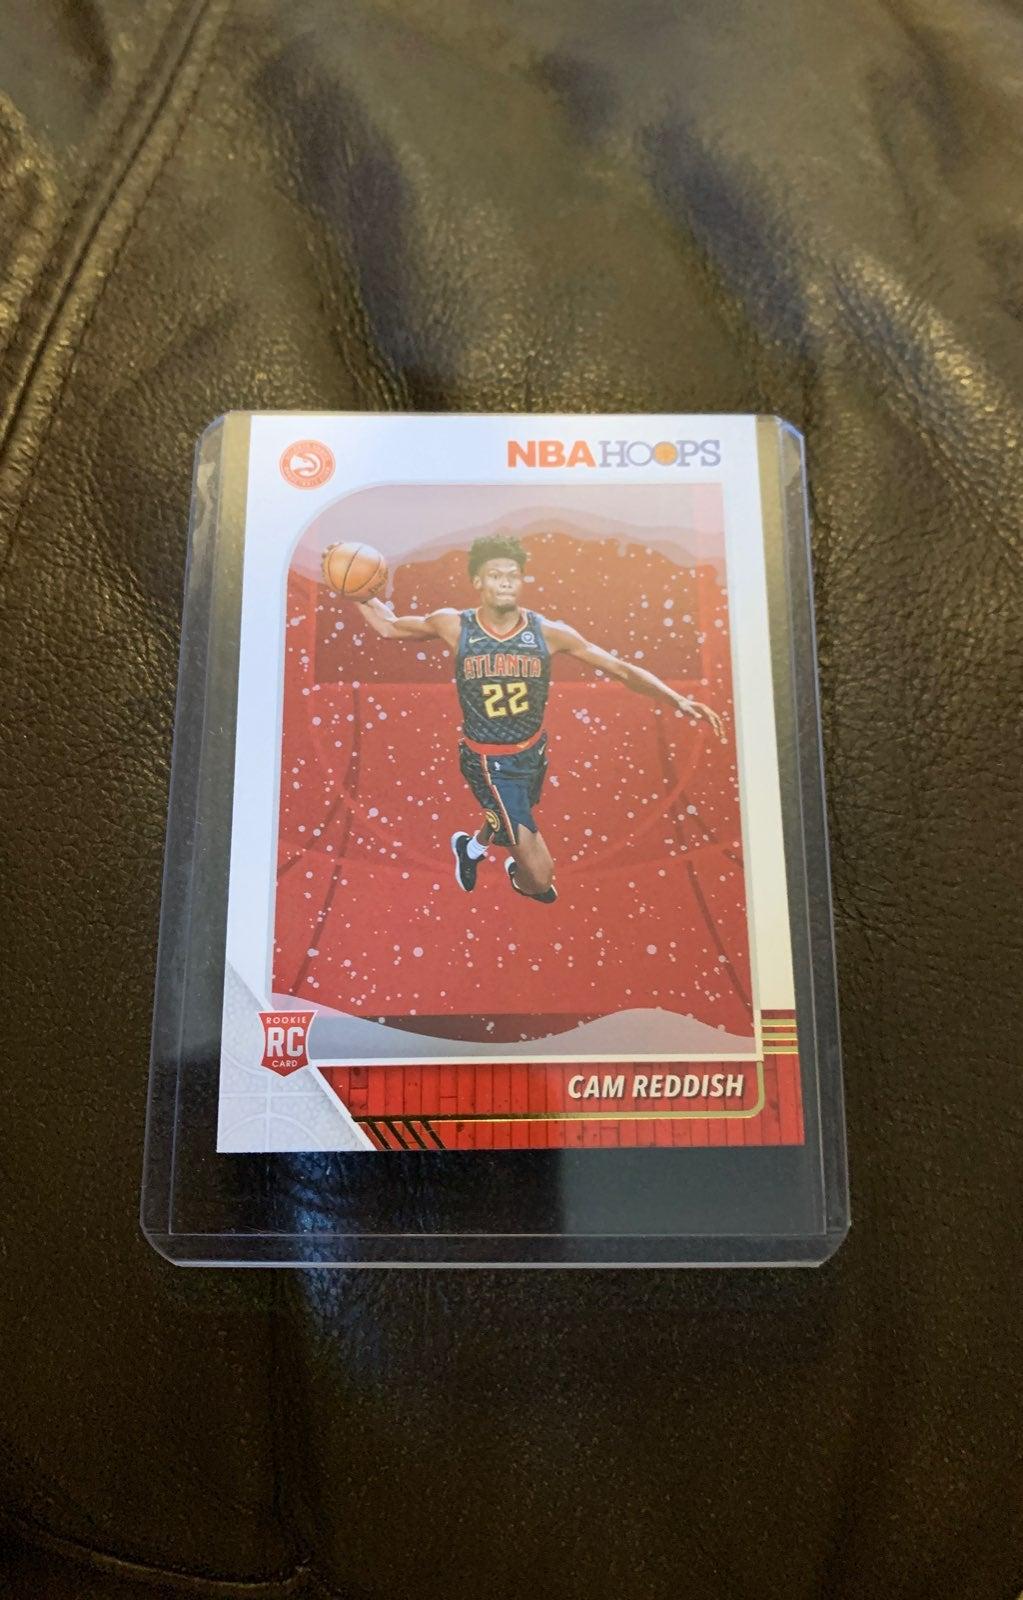 NBA hoops Cam Reddish